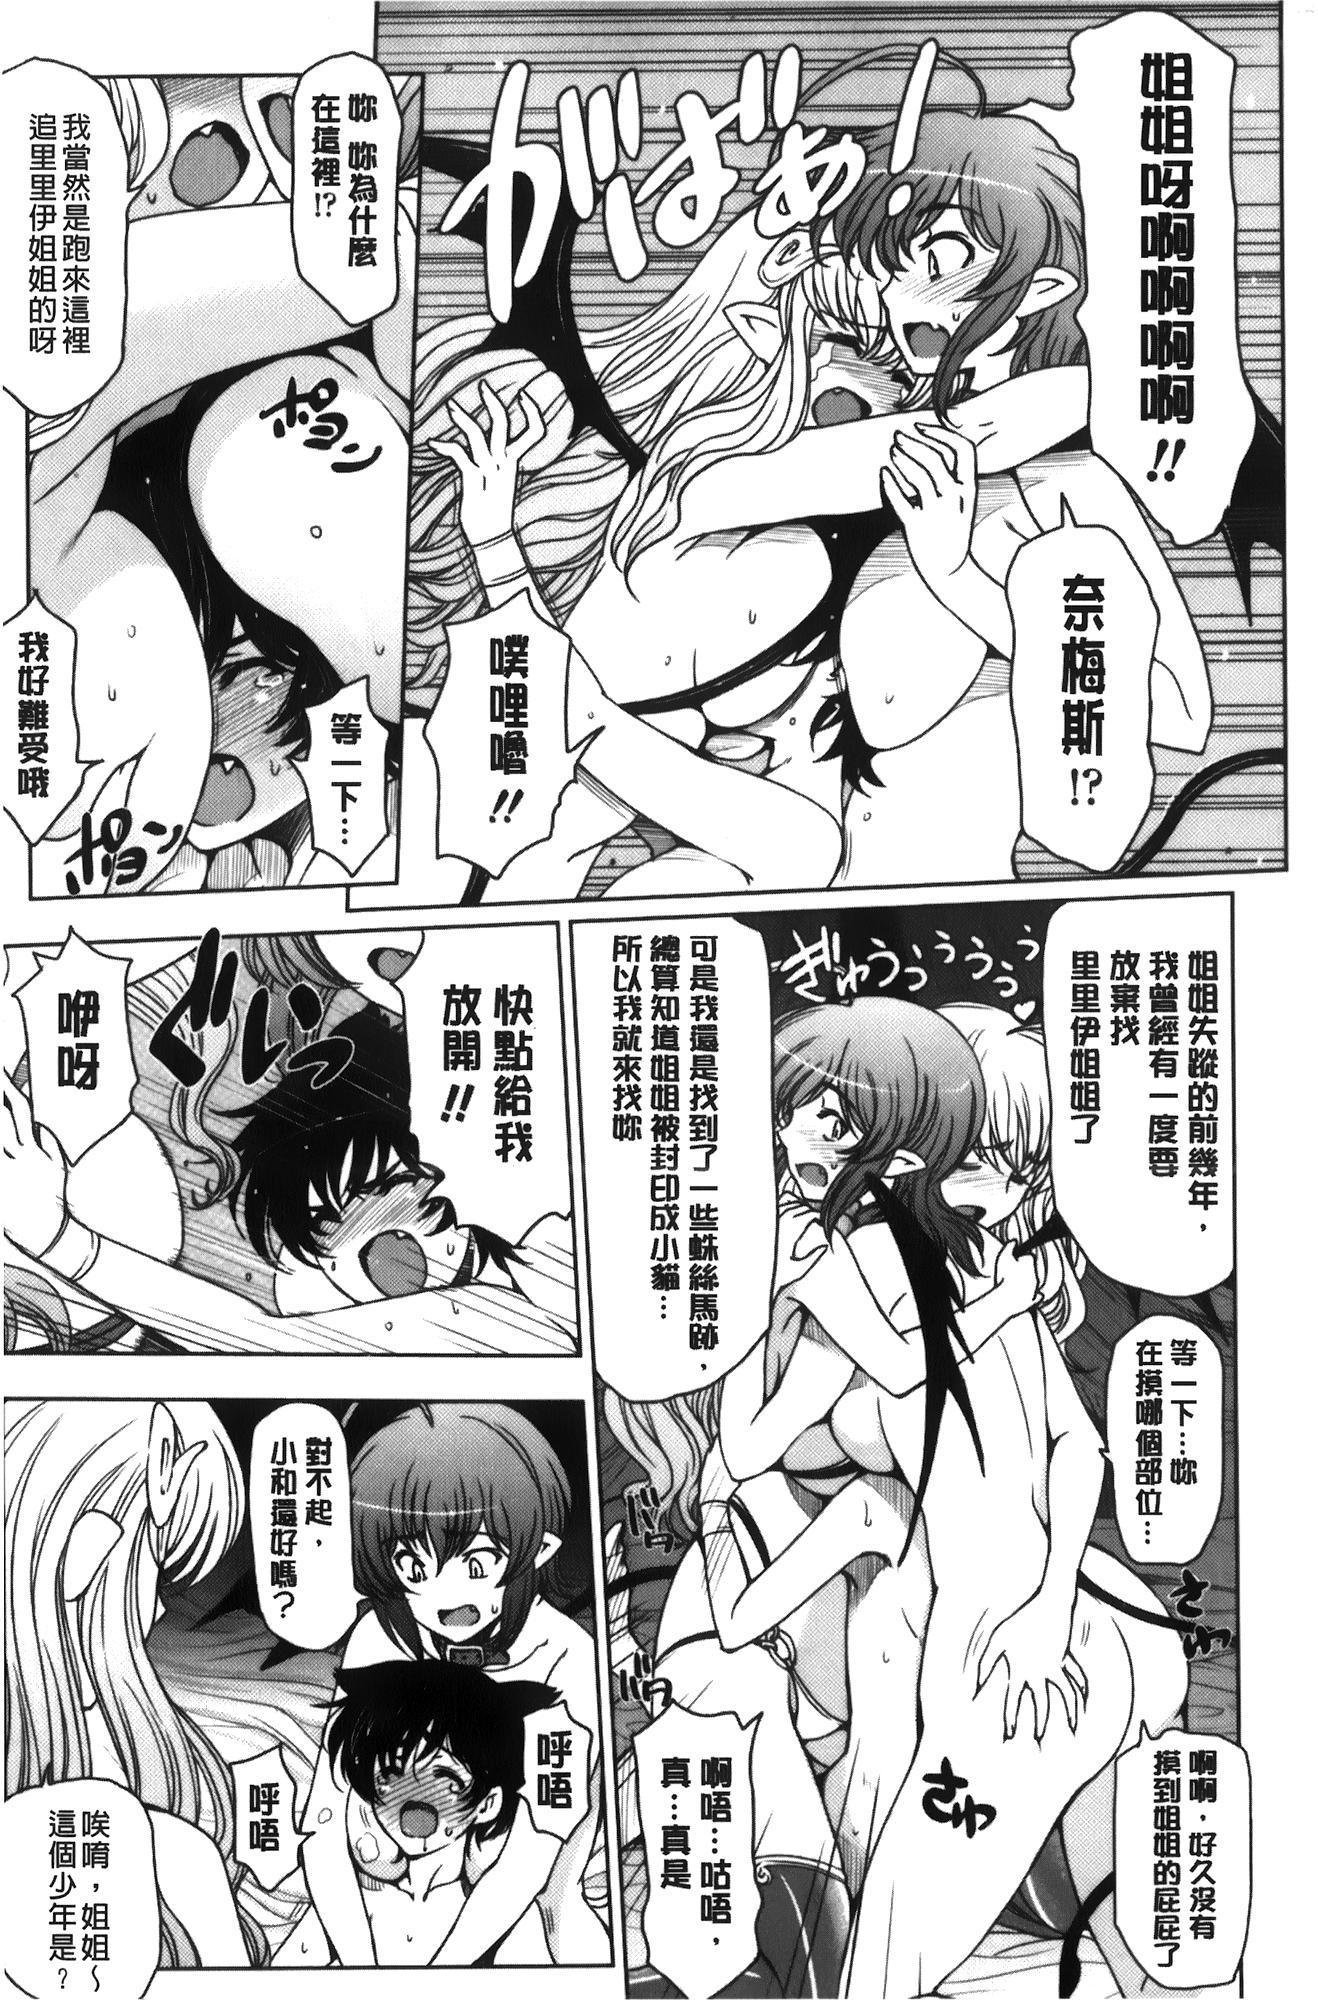 Majo × Shota ~ Genteiban | 魔女X小正太 限定版 115